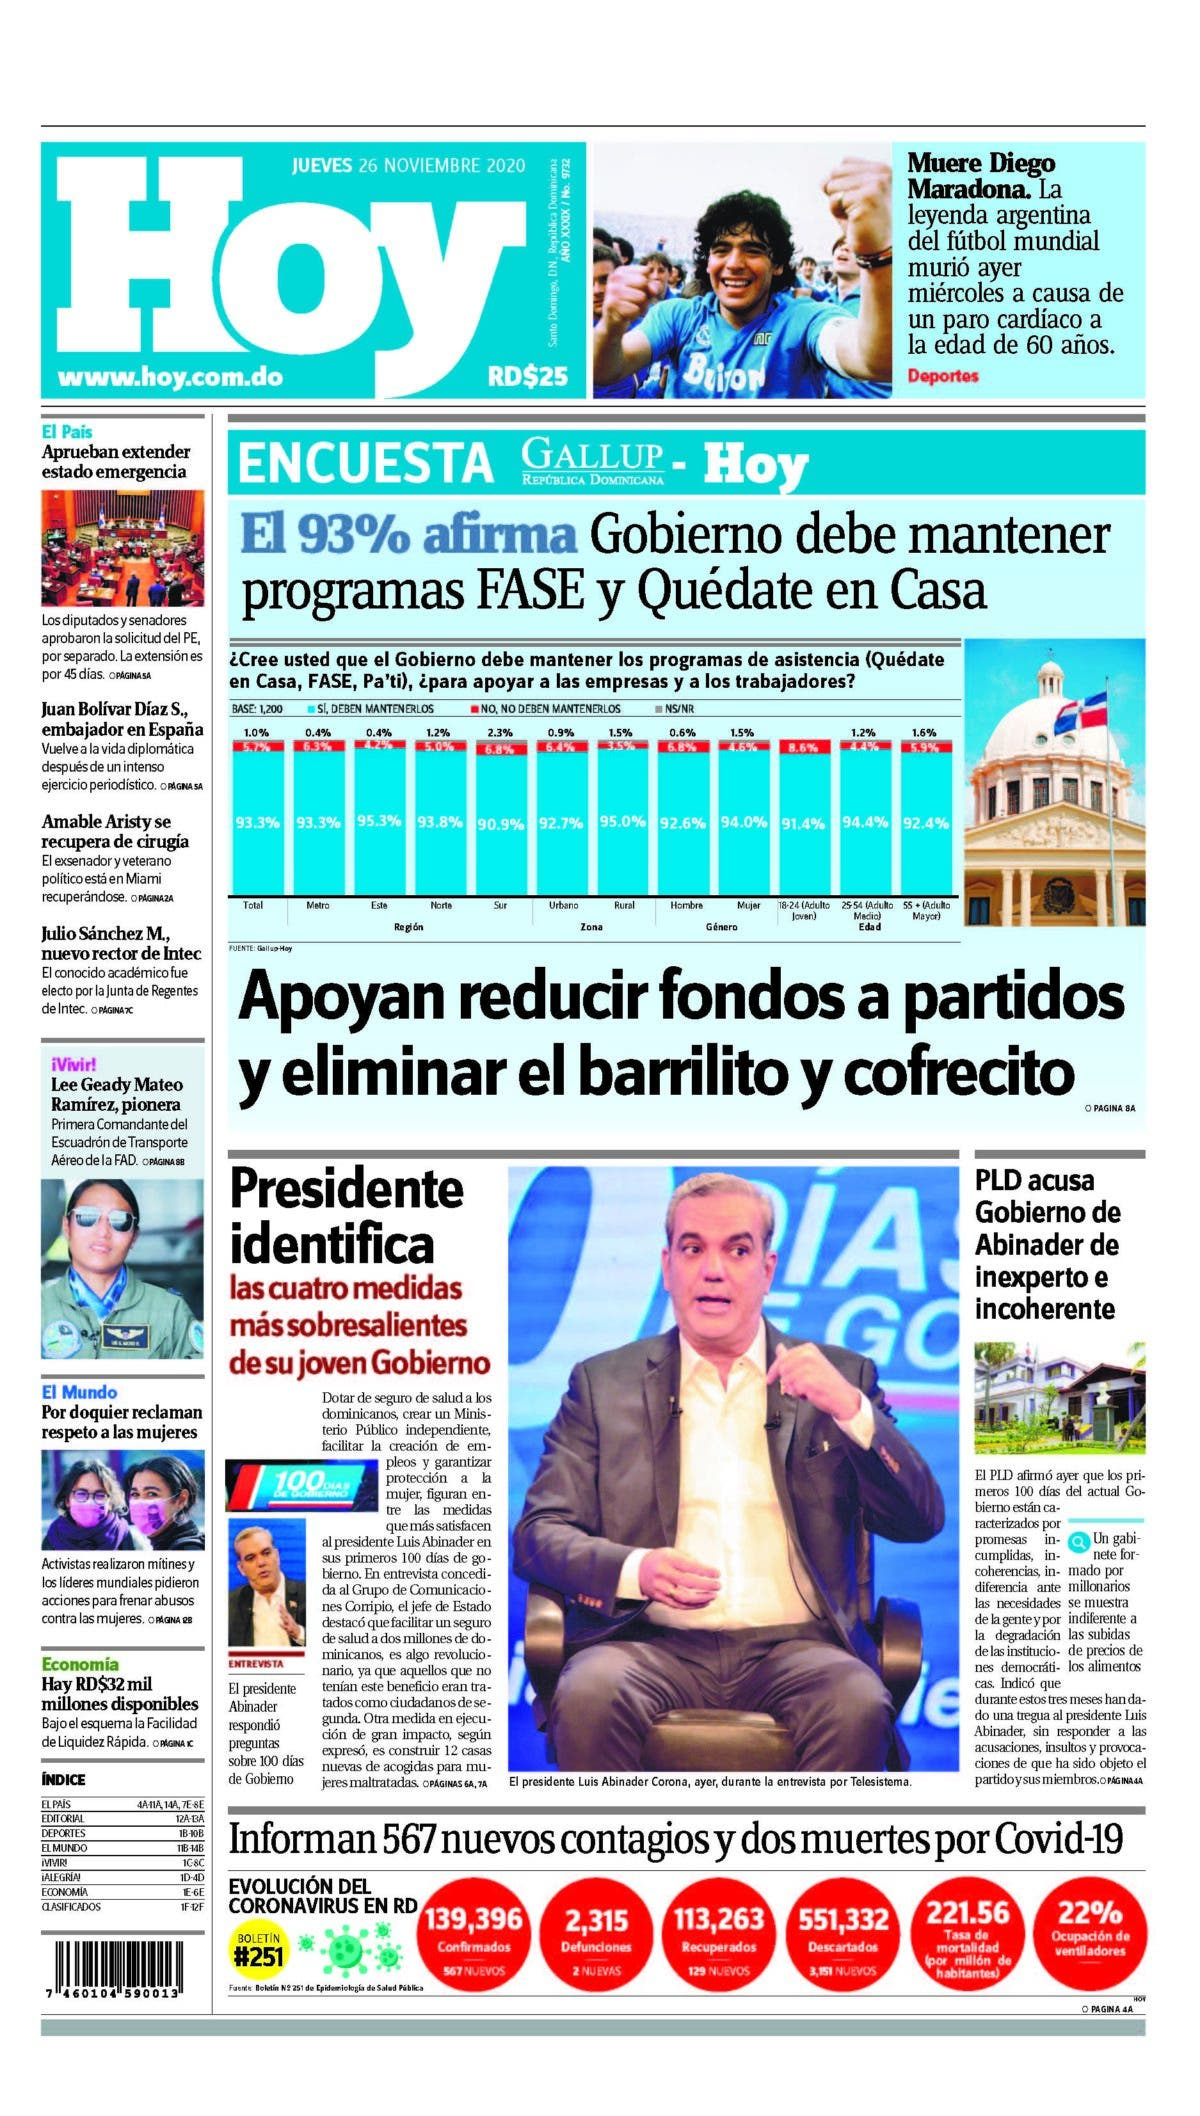 Portada Periódico Hoy, Jueves 26 de Noviembre, 2020